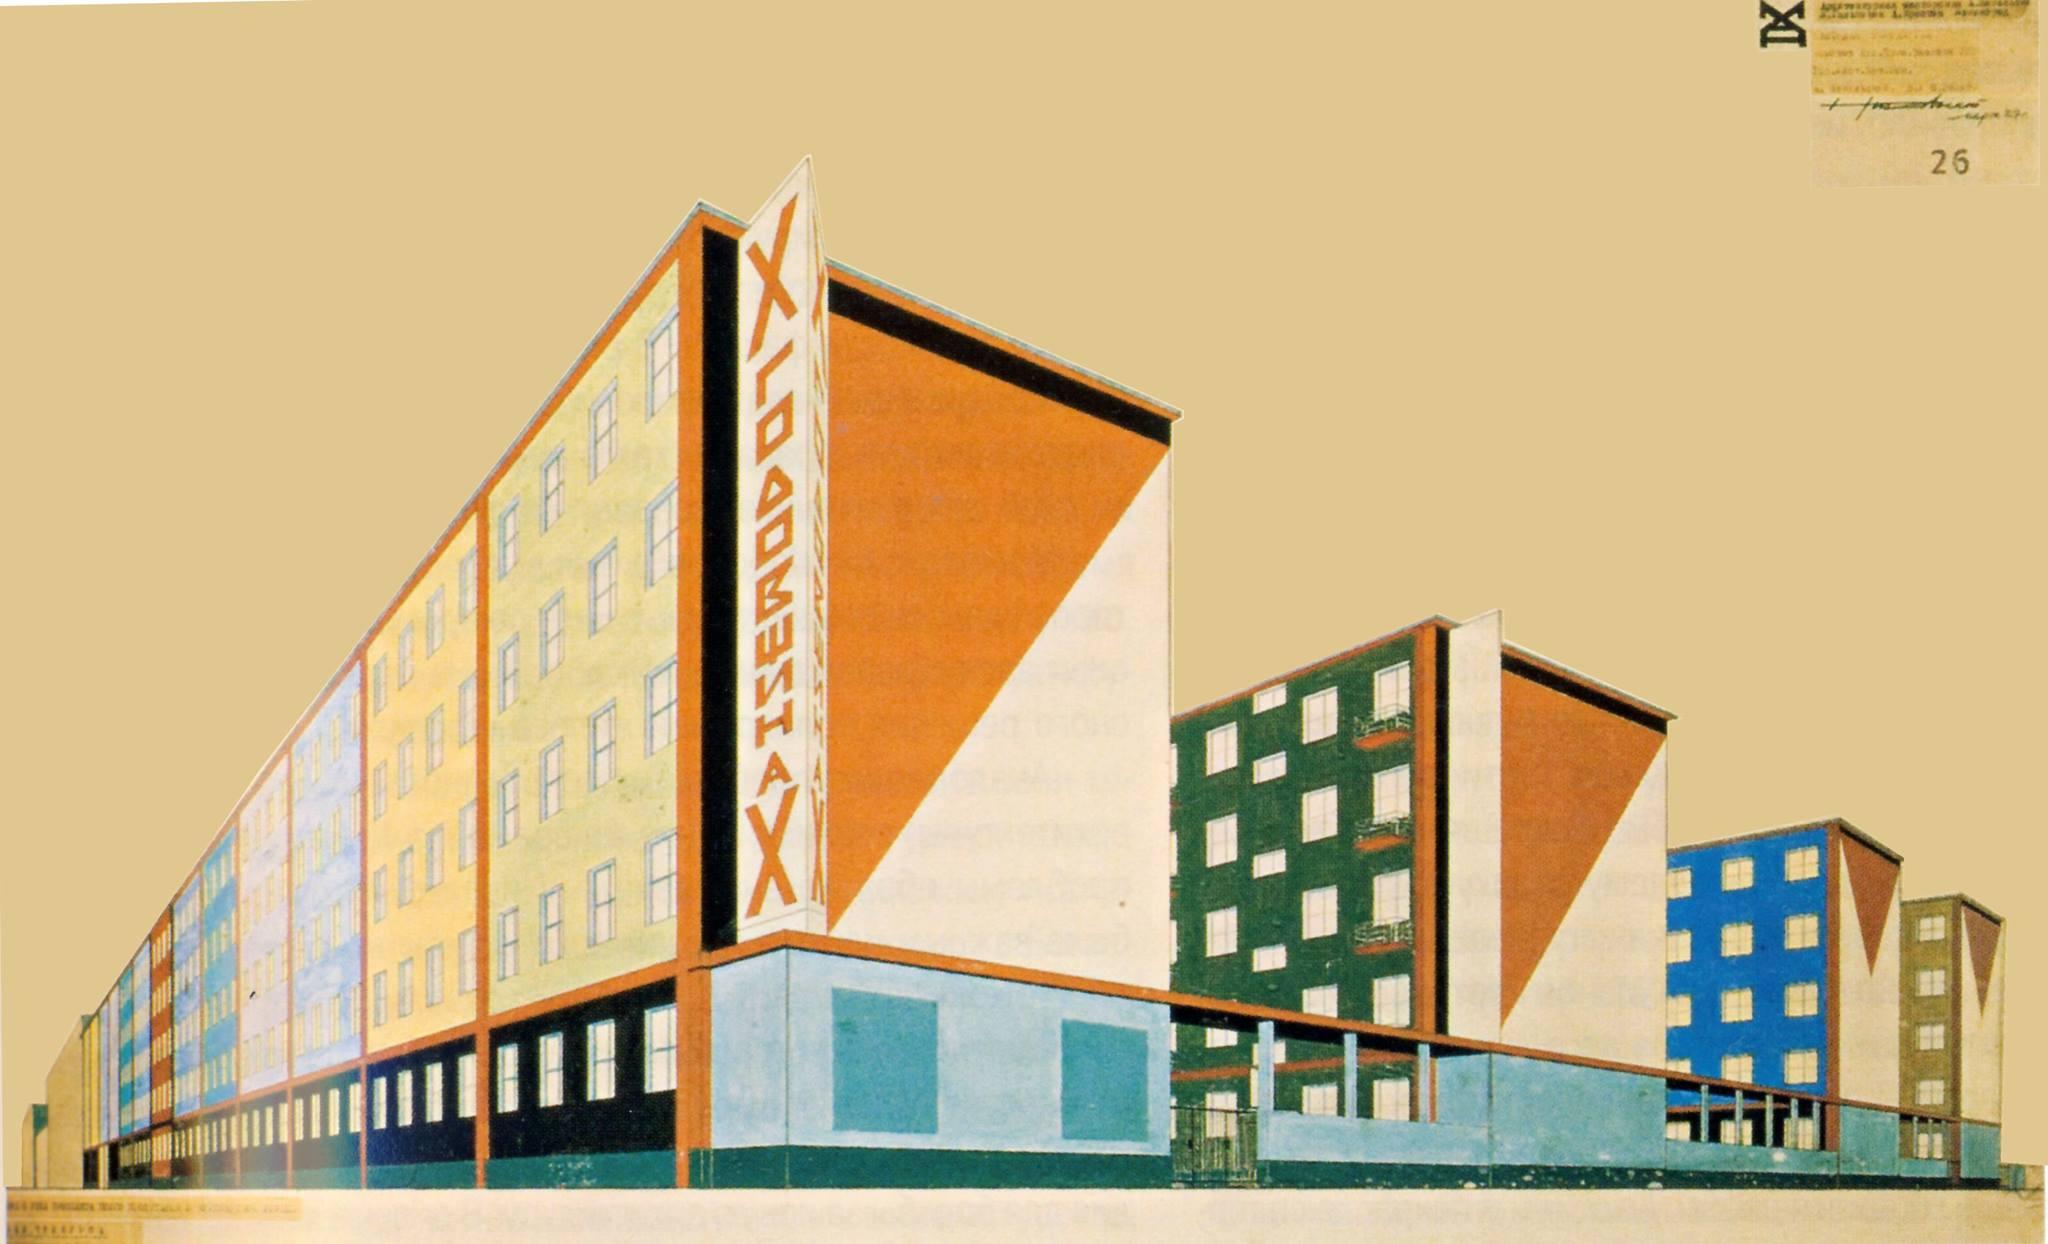 Color schemes for the new residential block (Zhilmassive) in Leningrad : Alexander Nikolsky Studio (МАН) + M. Ender, B. Ender artists : Perspective :: 1927